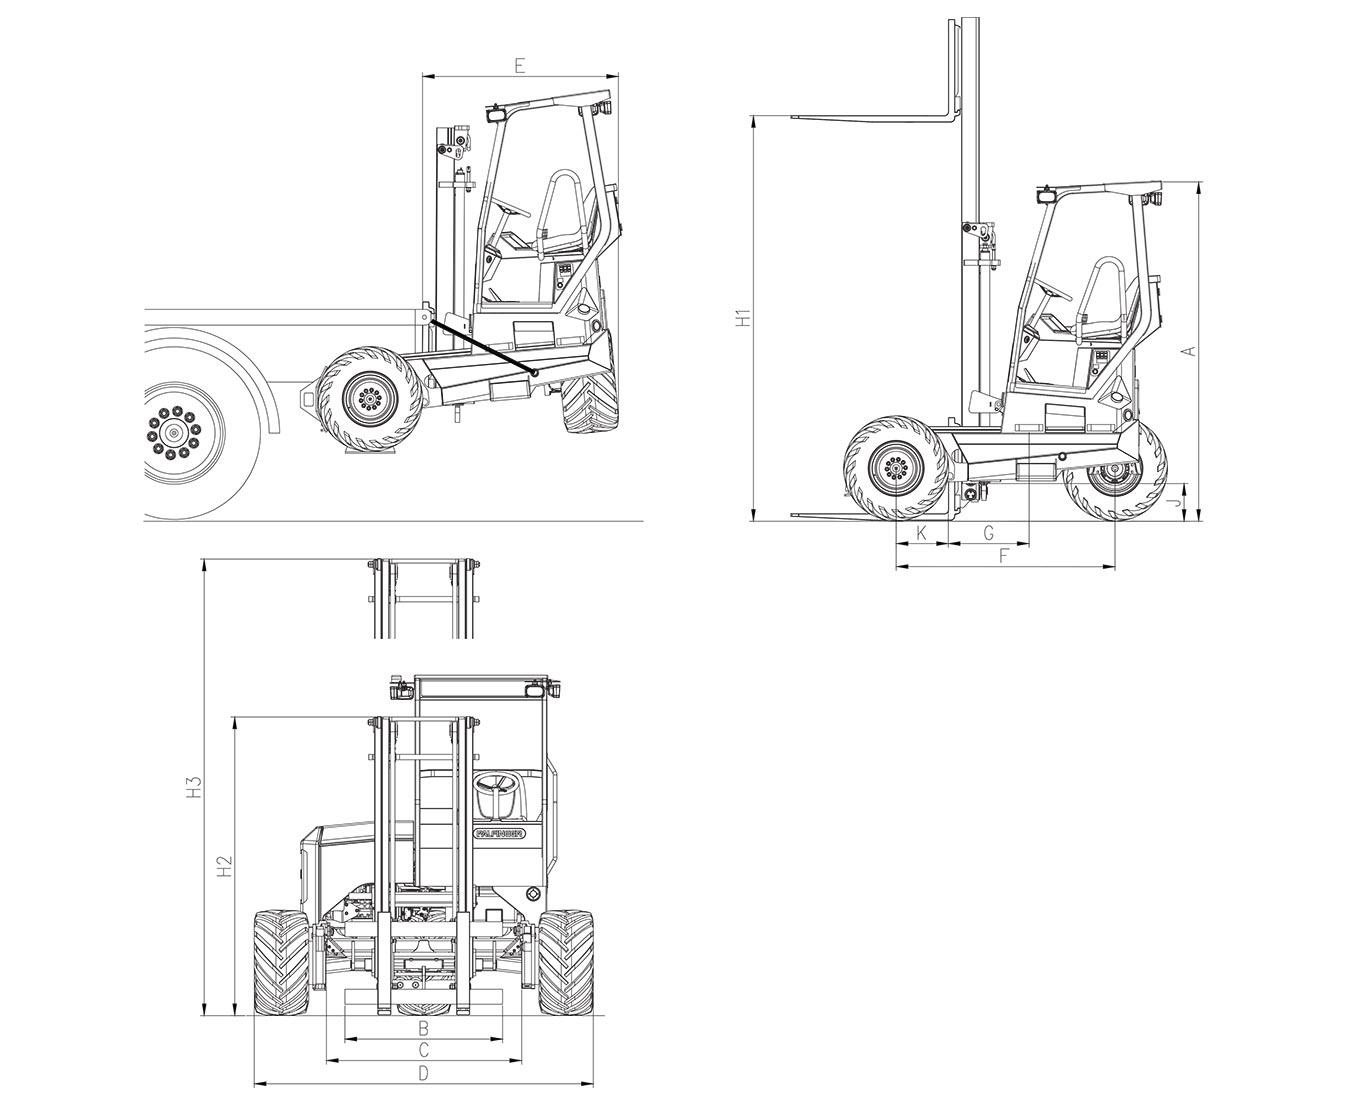 PALFINGER GLS 55 Standard Technical Drawings